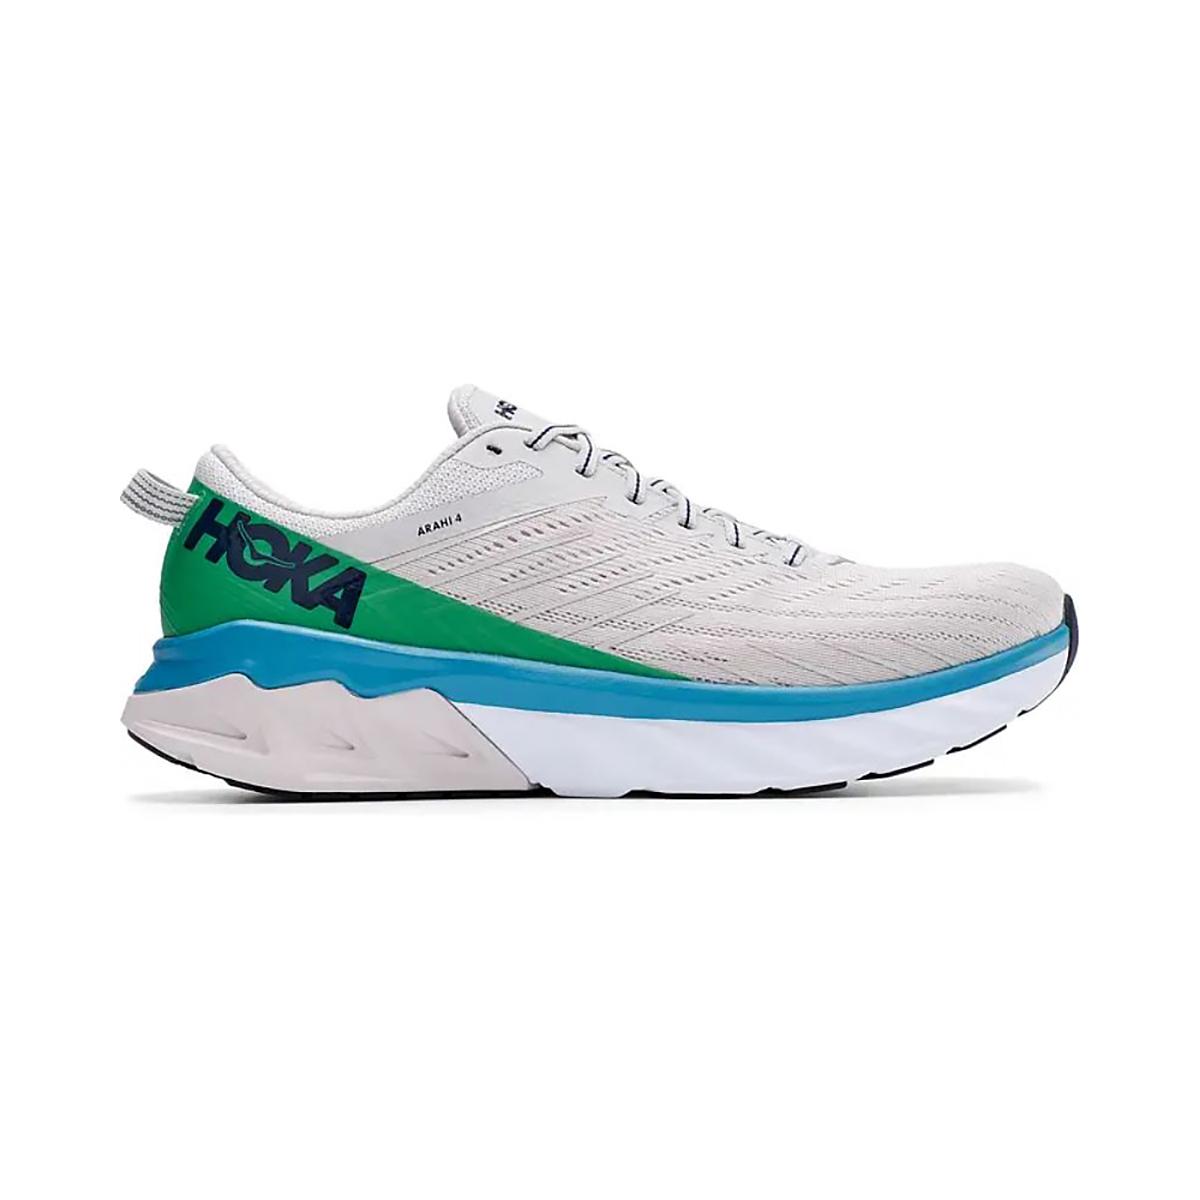 HOKA One One Arahi 4 Running Shoe $79.98 + Free Shipping